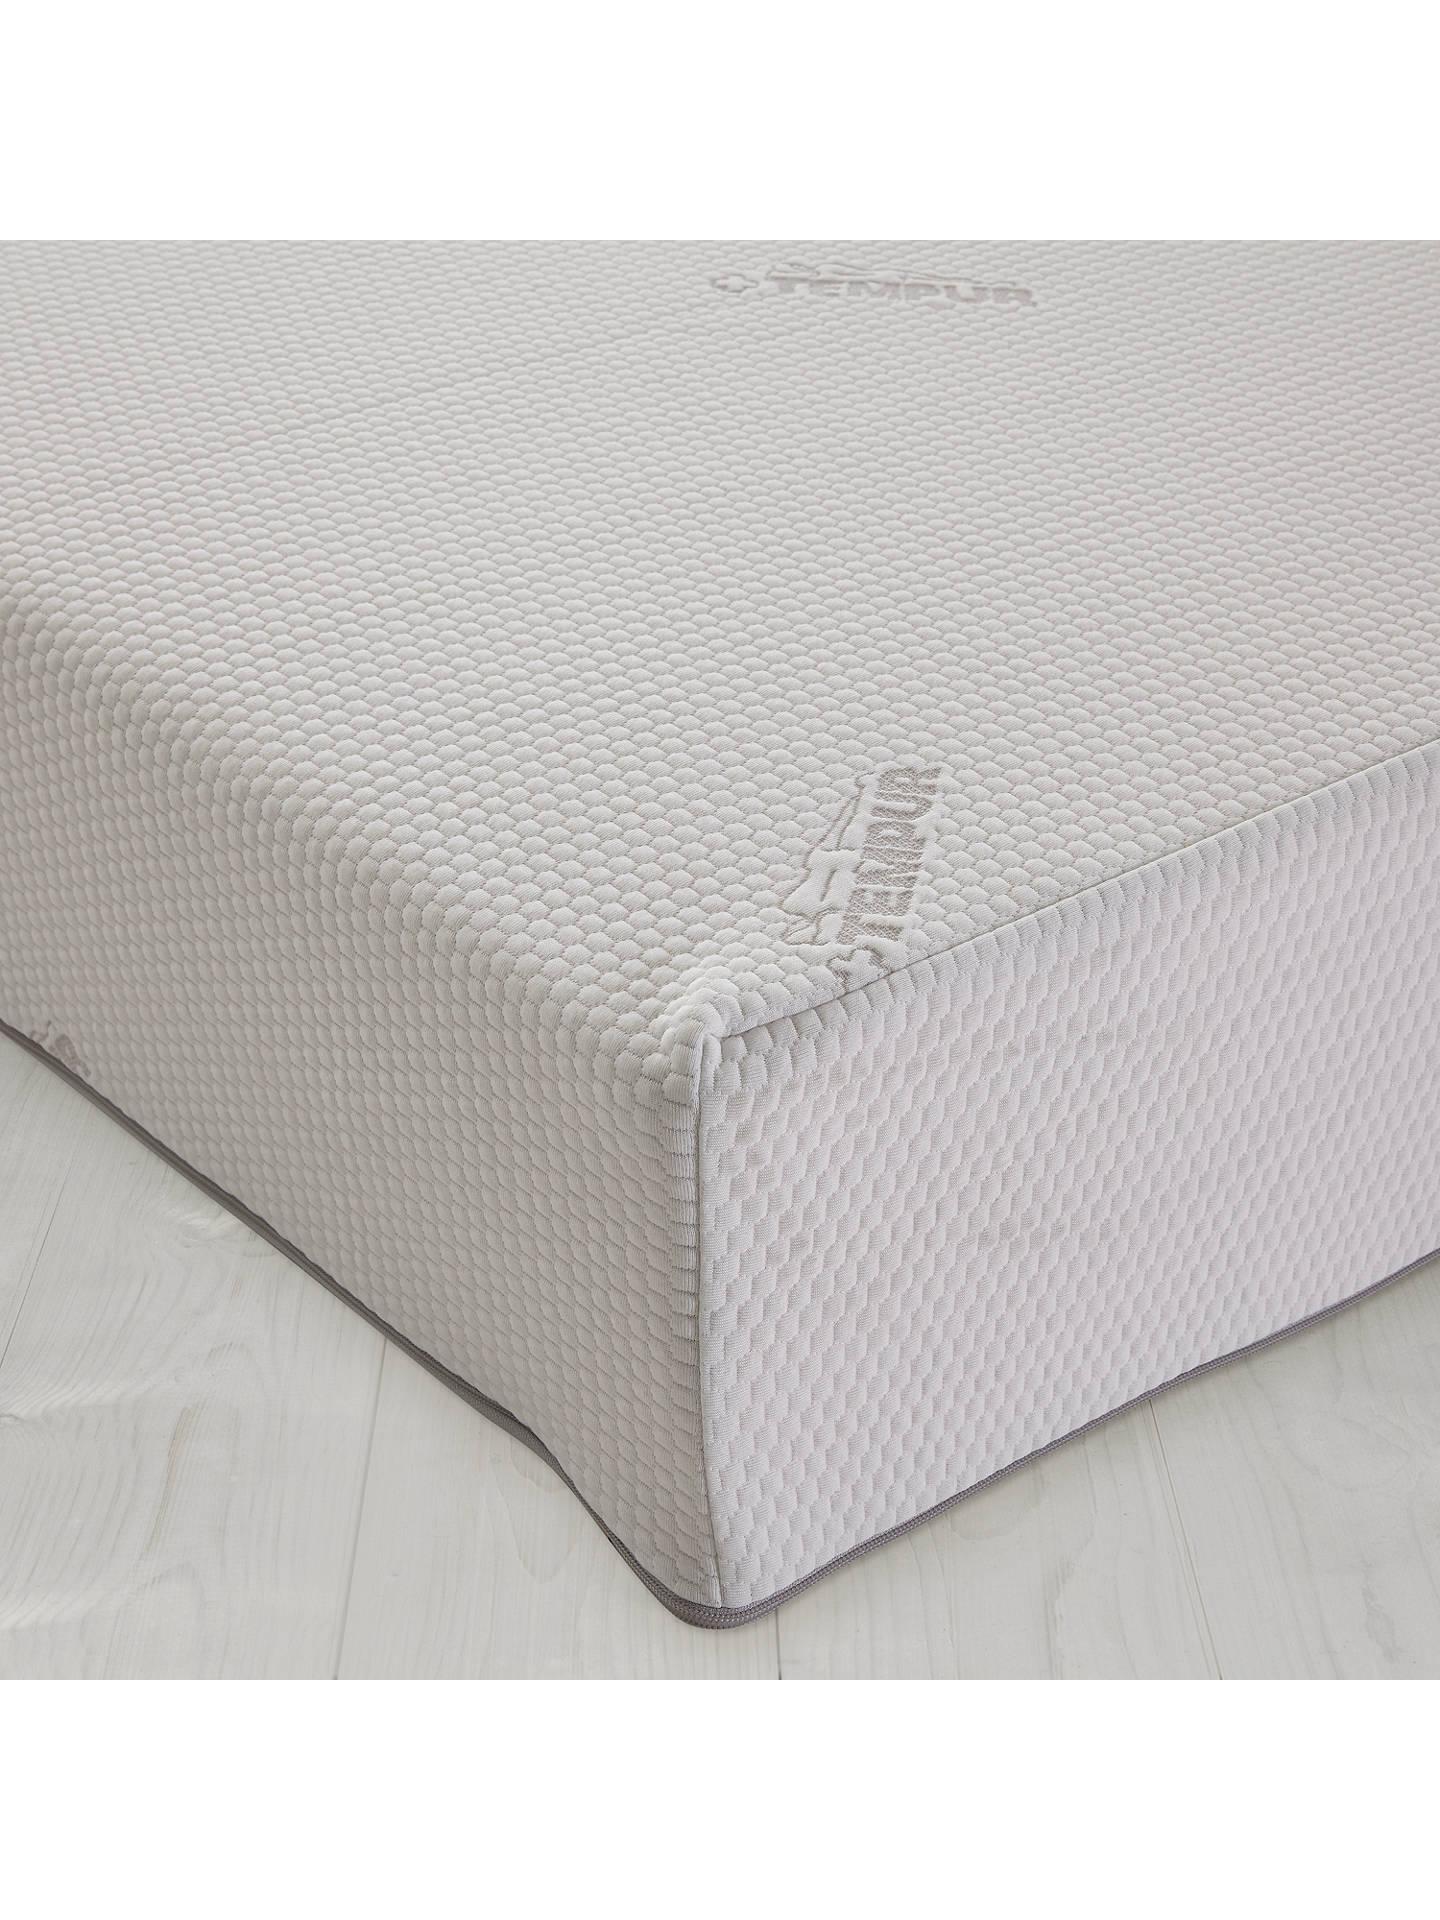 tempur sensation 21 memory foam mattress medium king. Black Bedroom Furniture Sets. Home Design Ideas